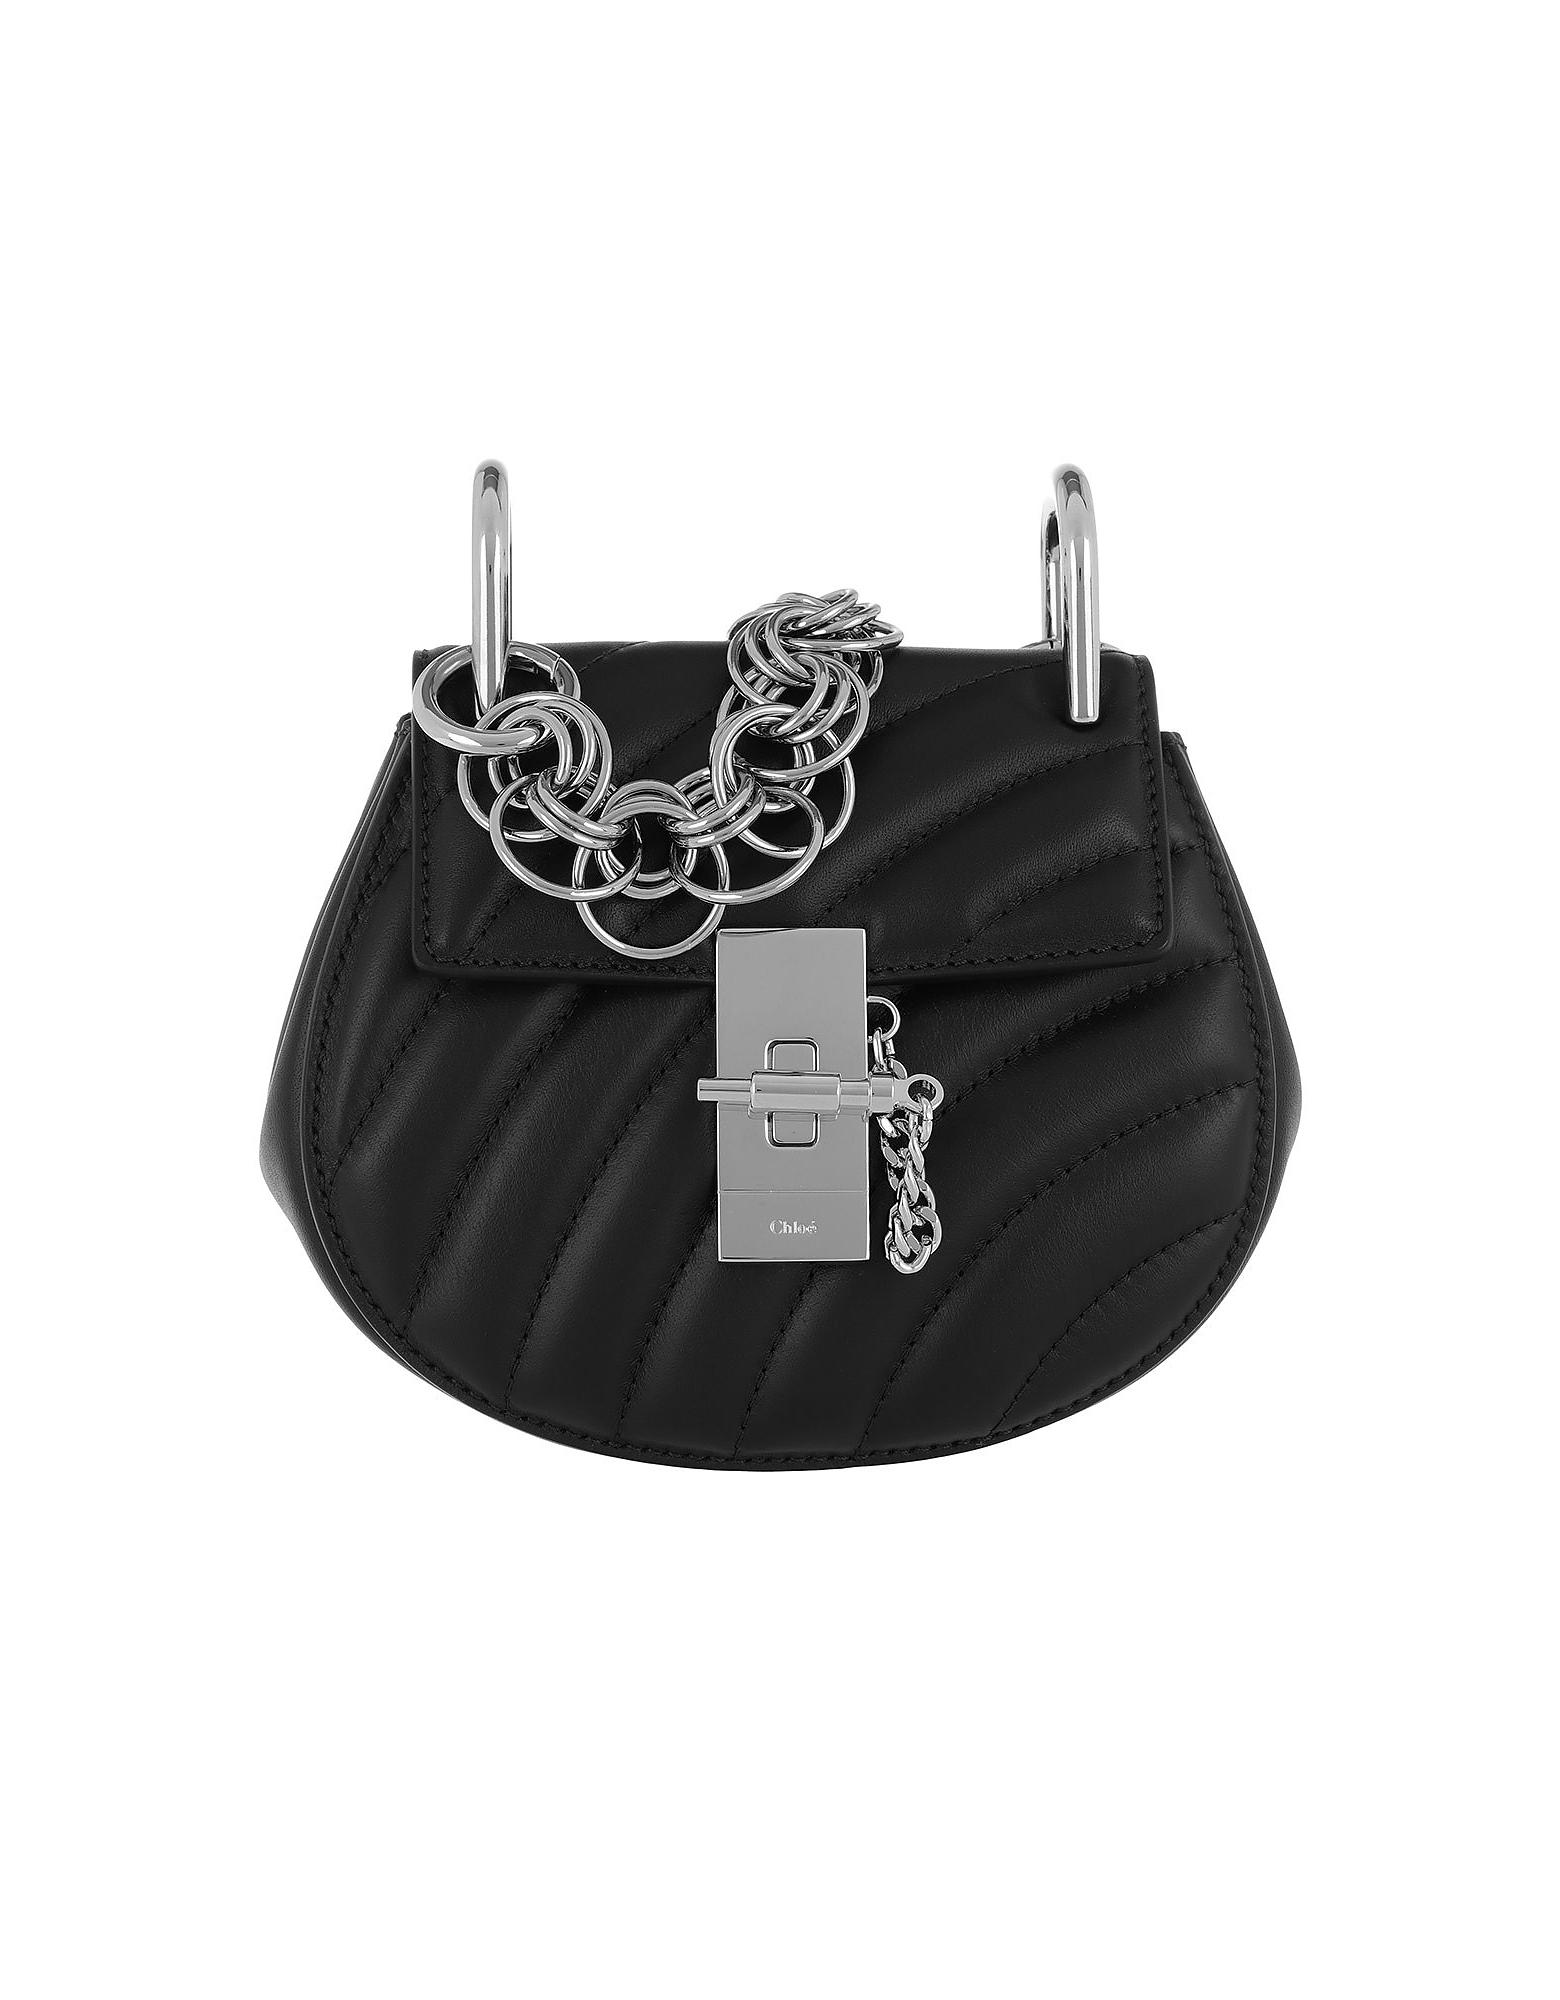 Drew Bijou Mini Shoulder Bag Black